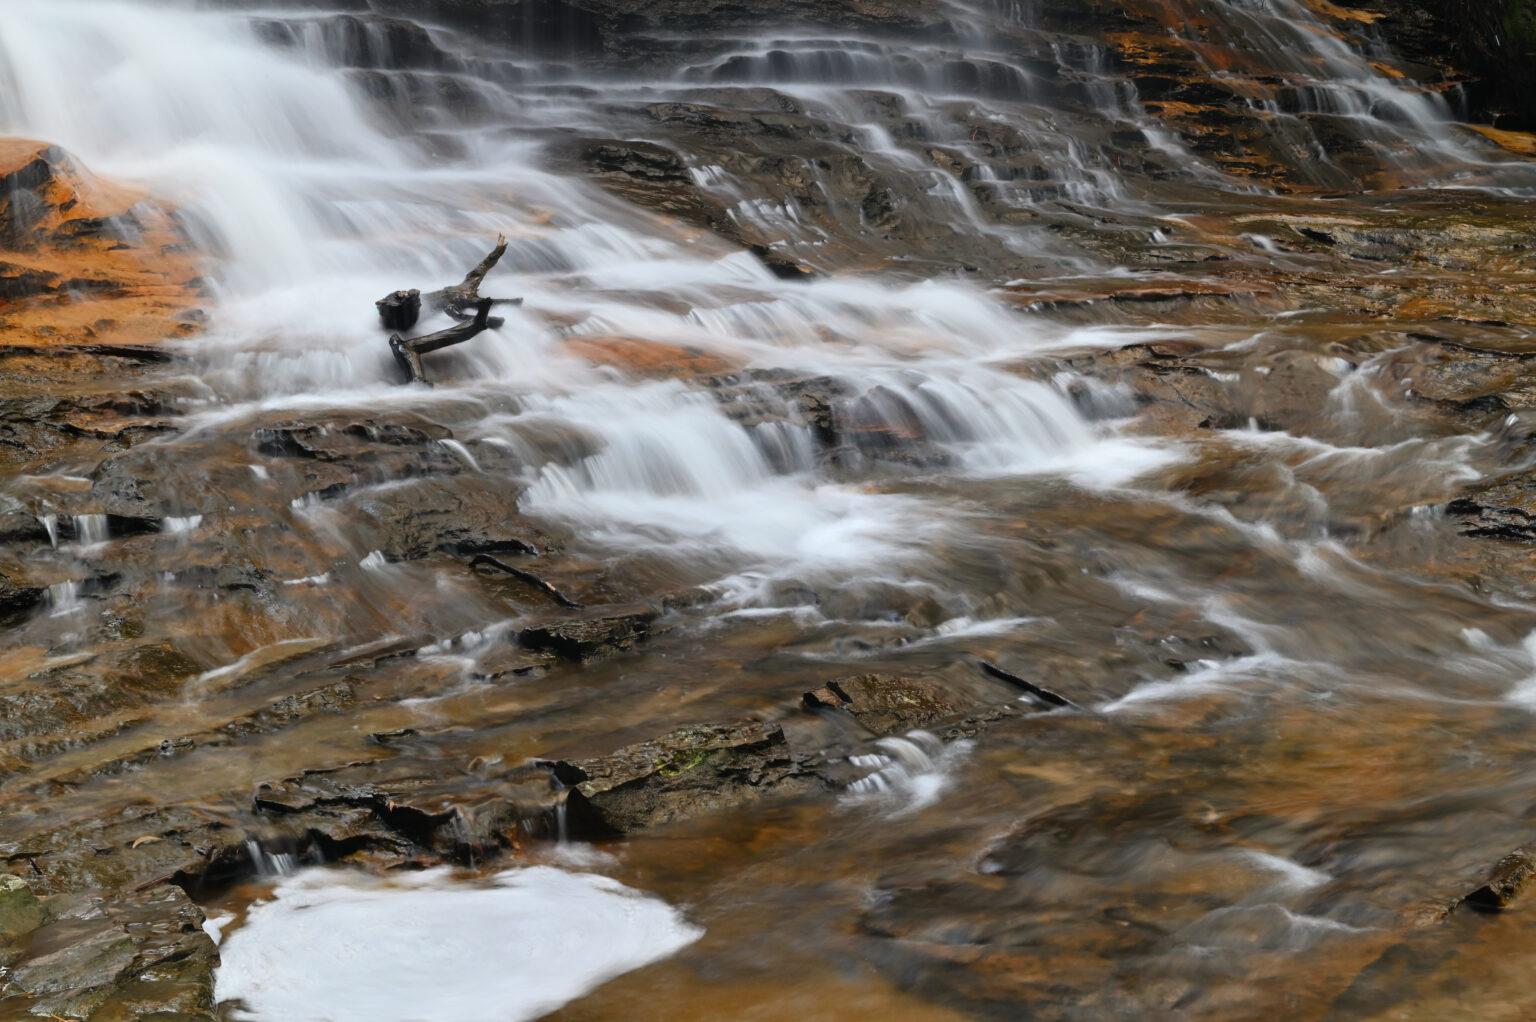 Weeping Rock falls